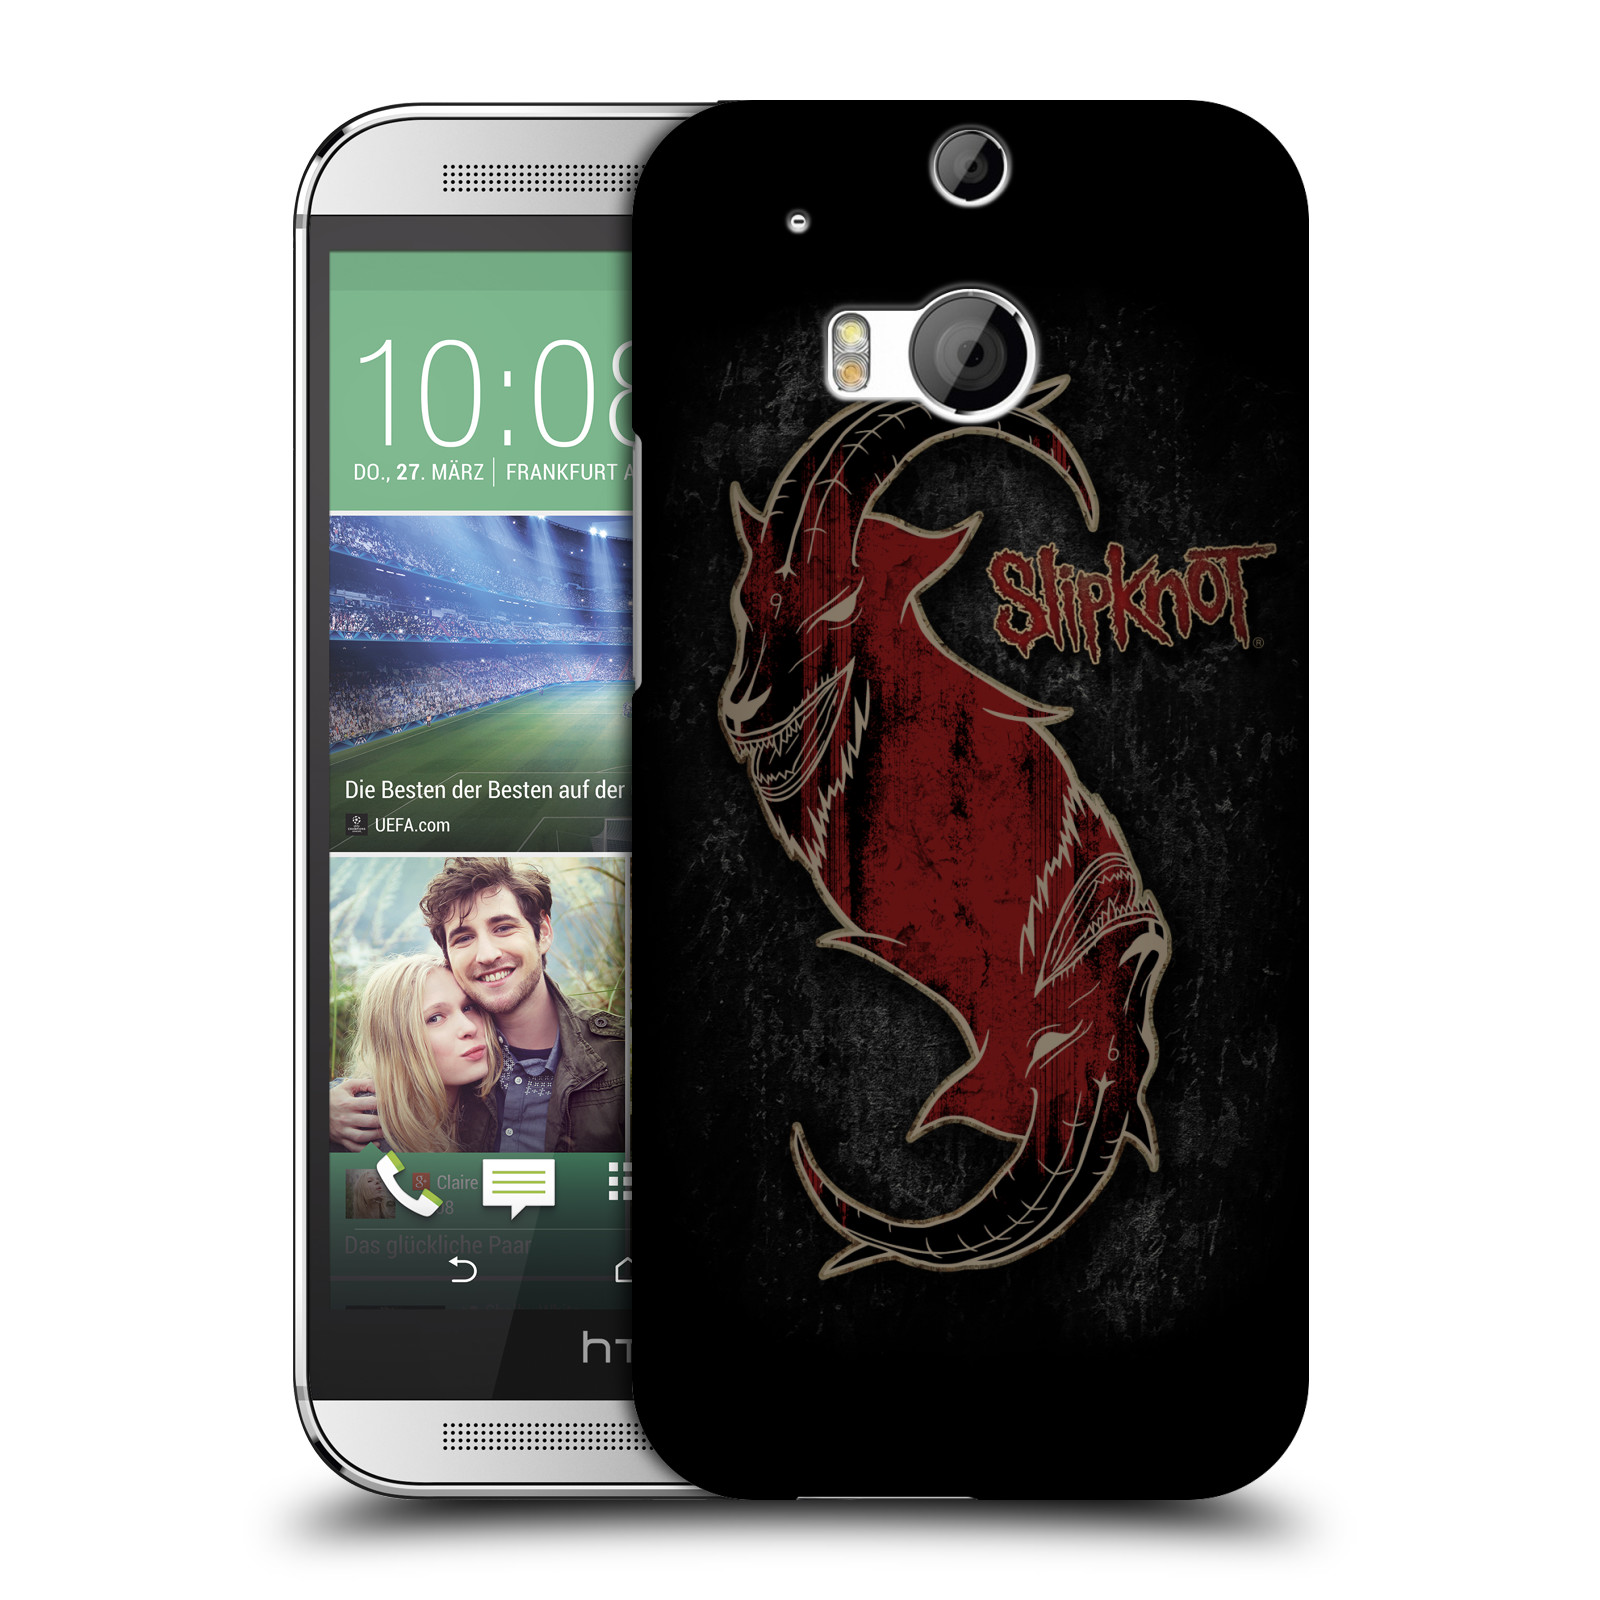 Plastové pouzdro na mobil HTC ONE M8 HEAD CASE Slipknot - Rudý kozel